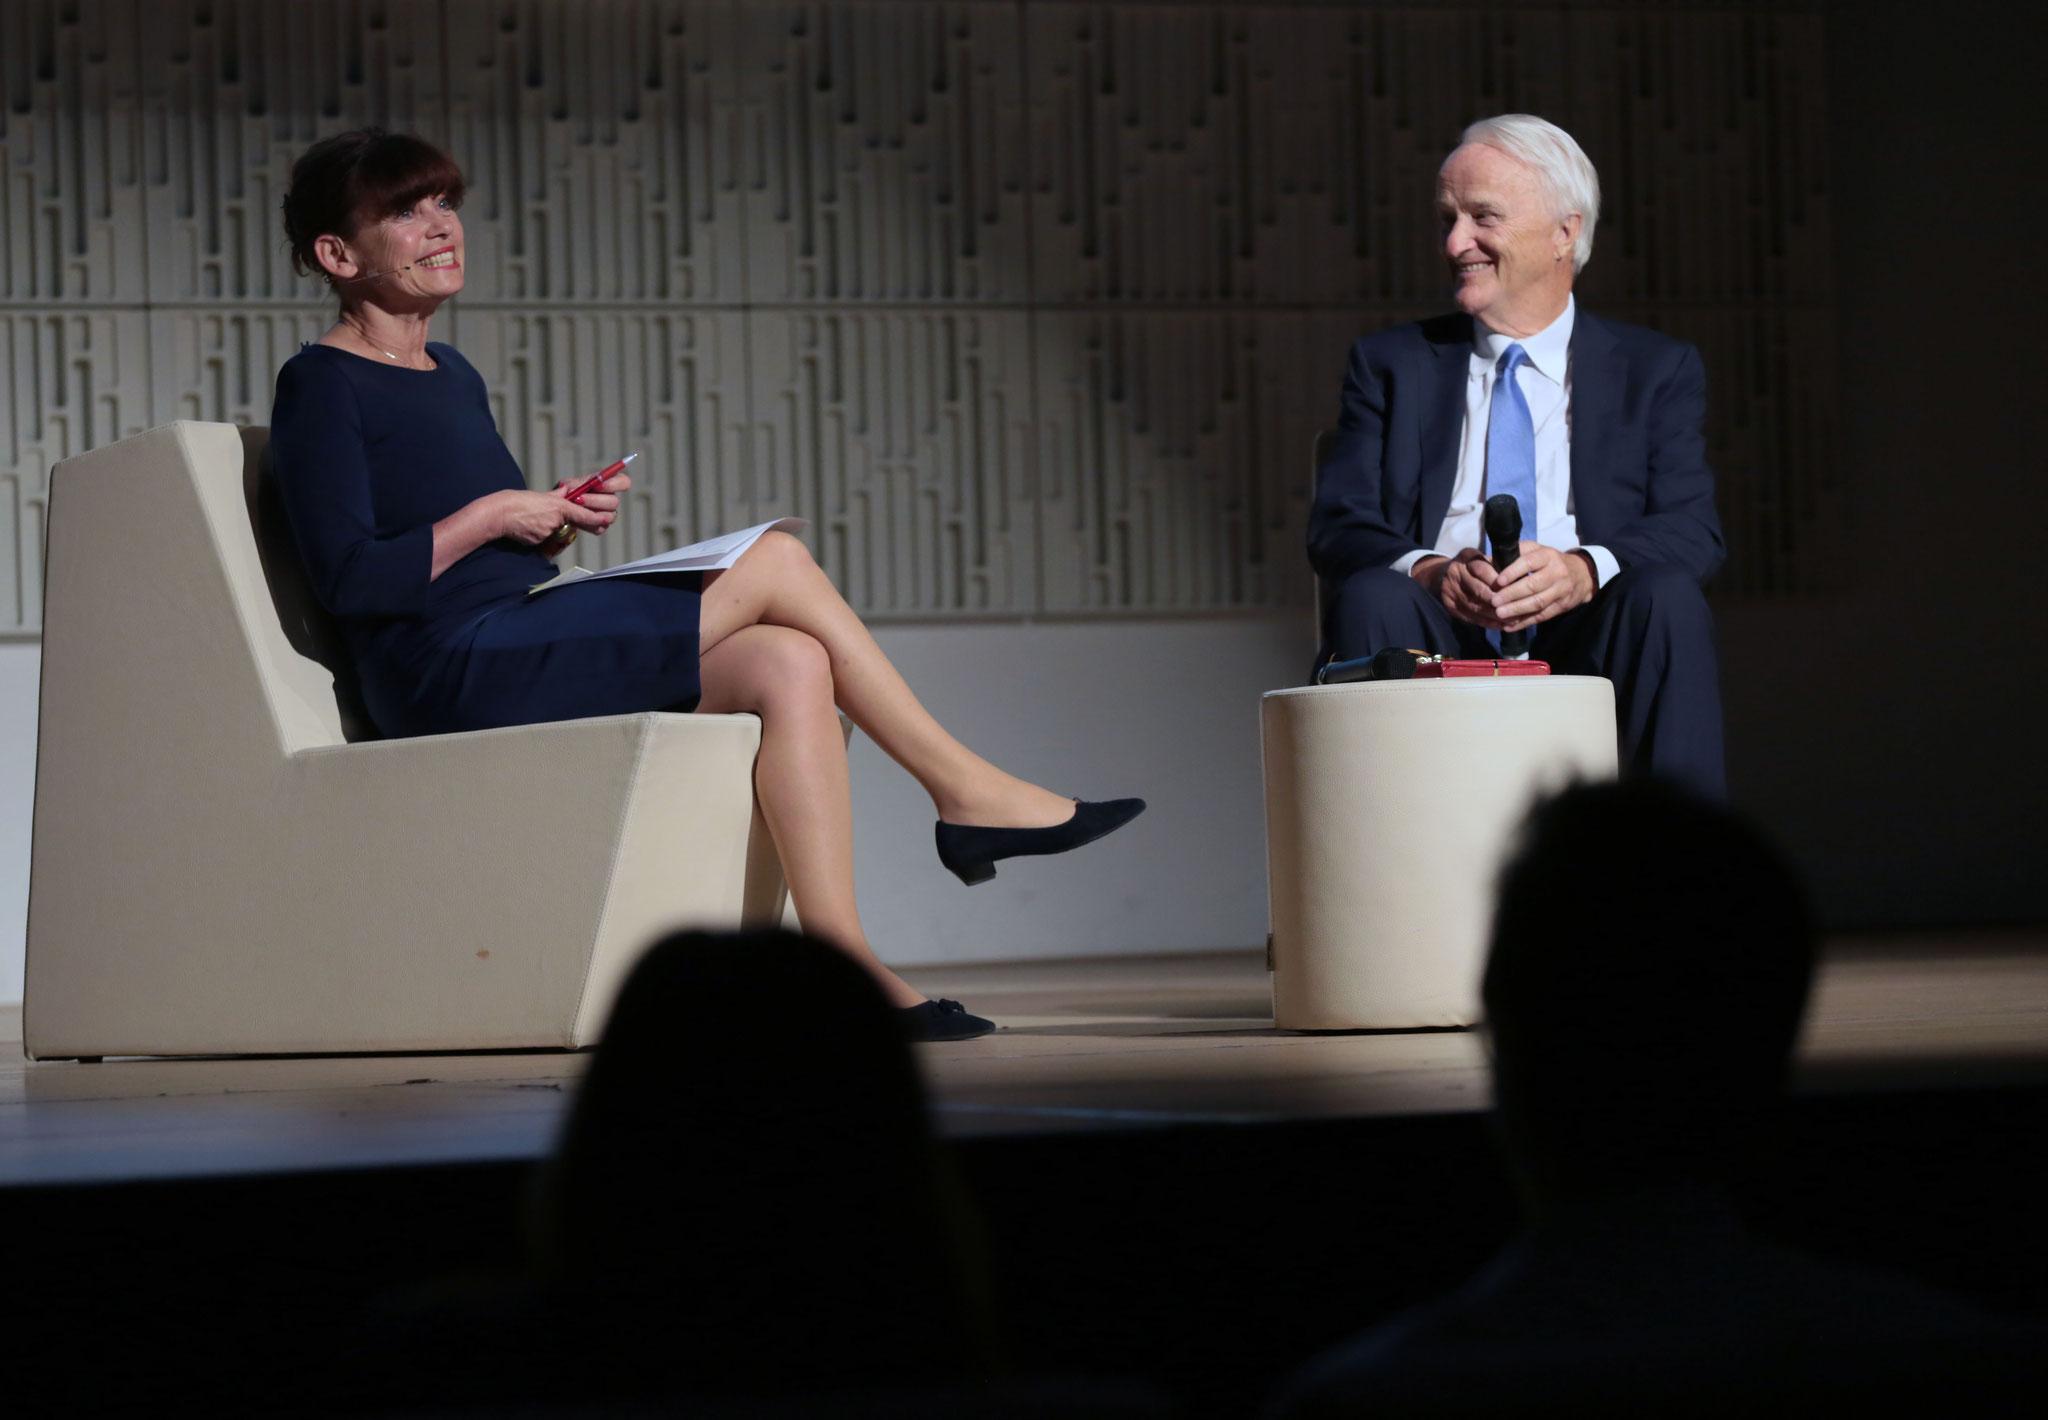 Renata Schmidtkunz, Werner Schöny